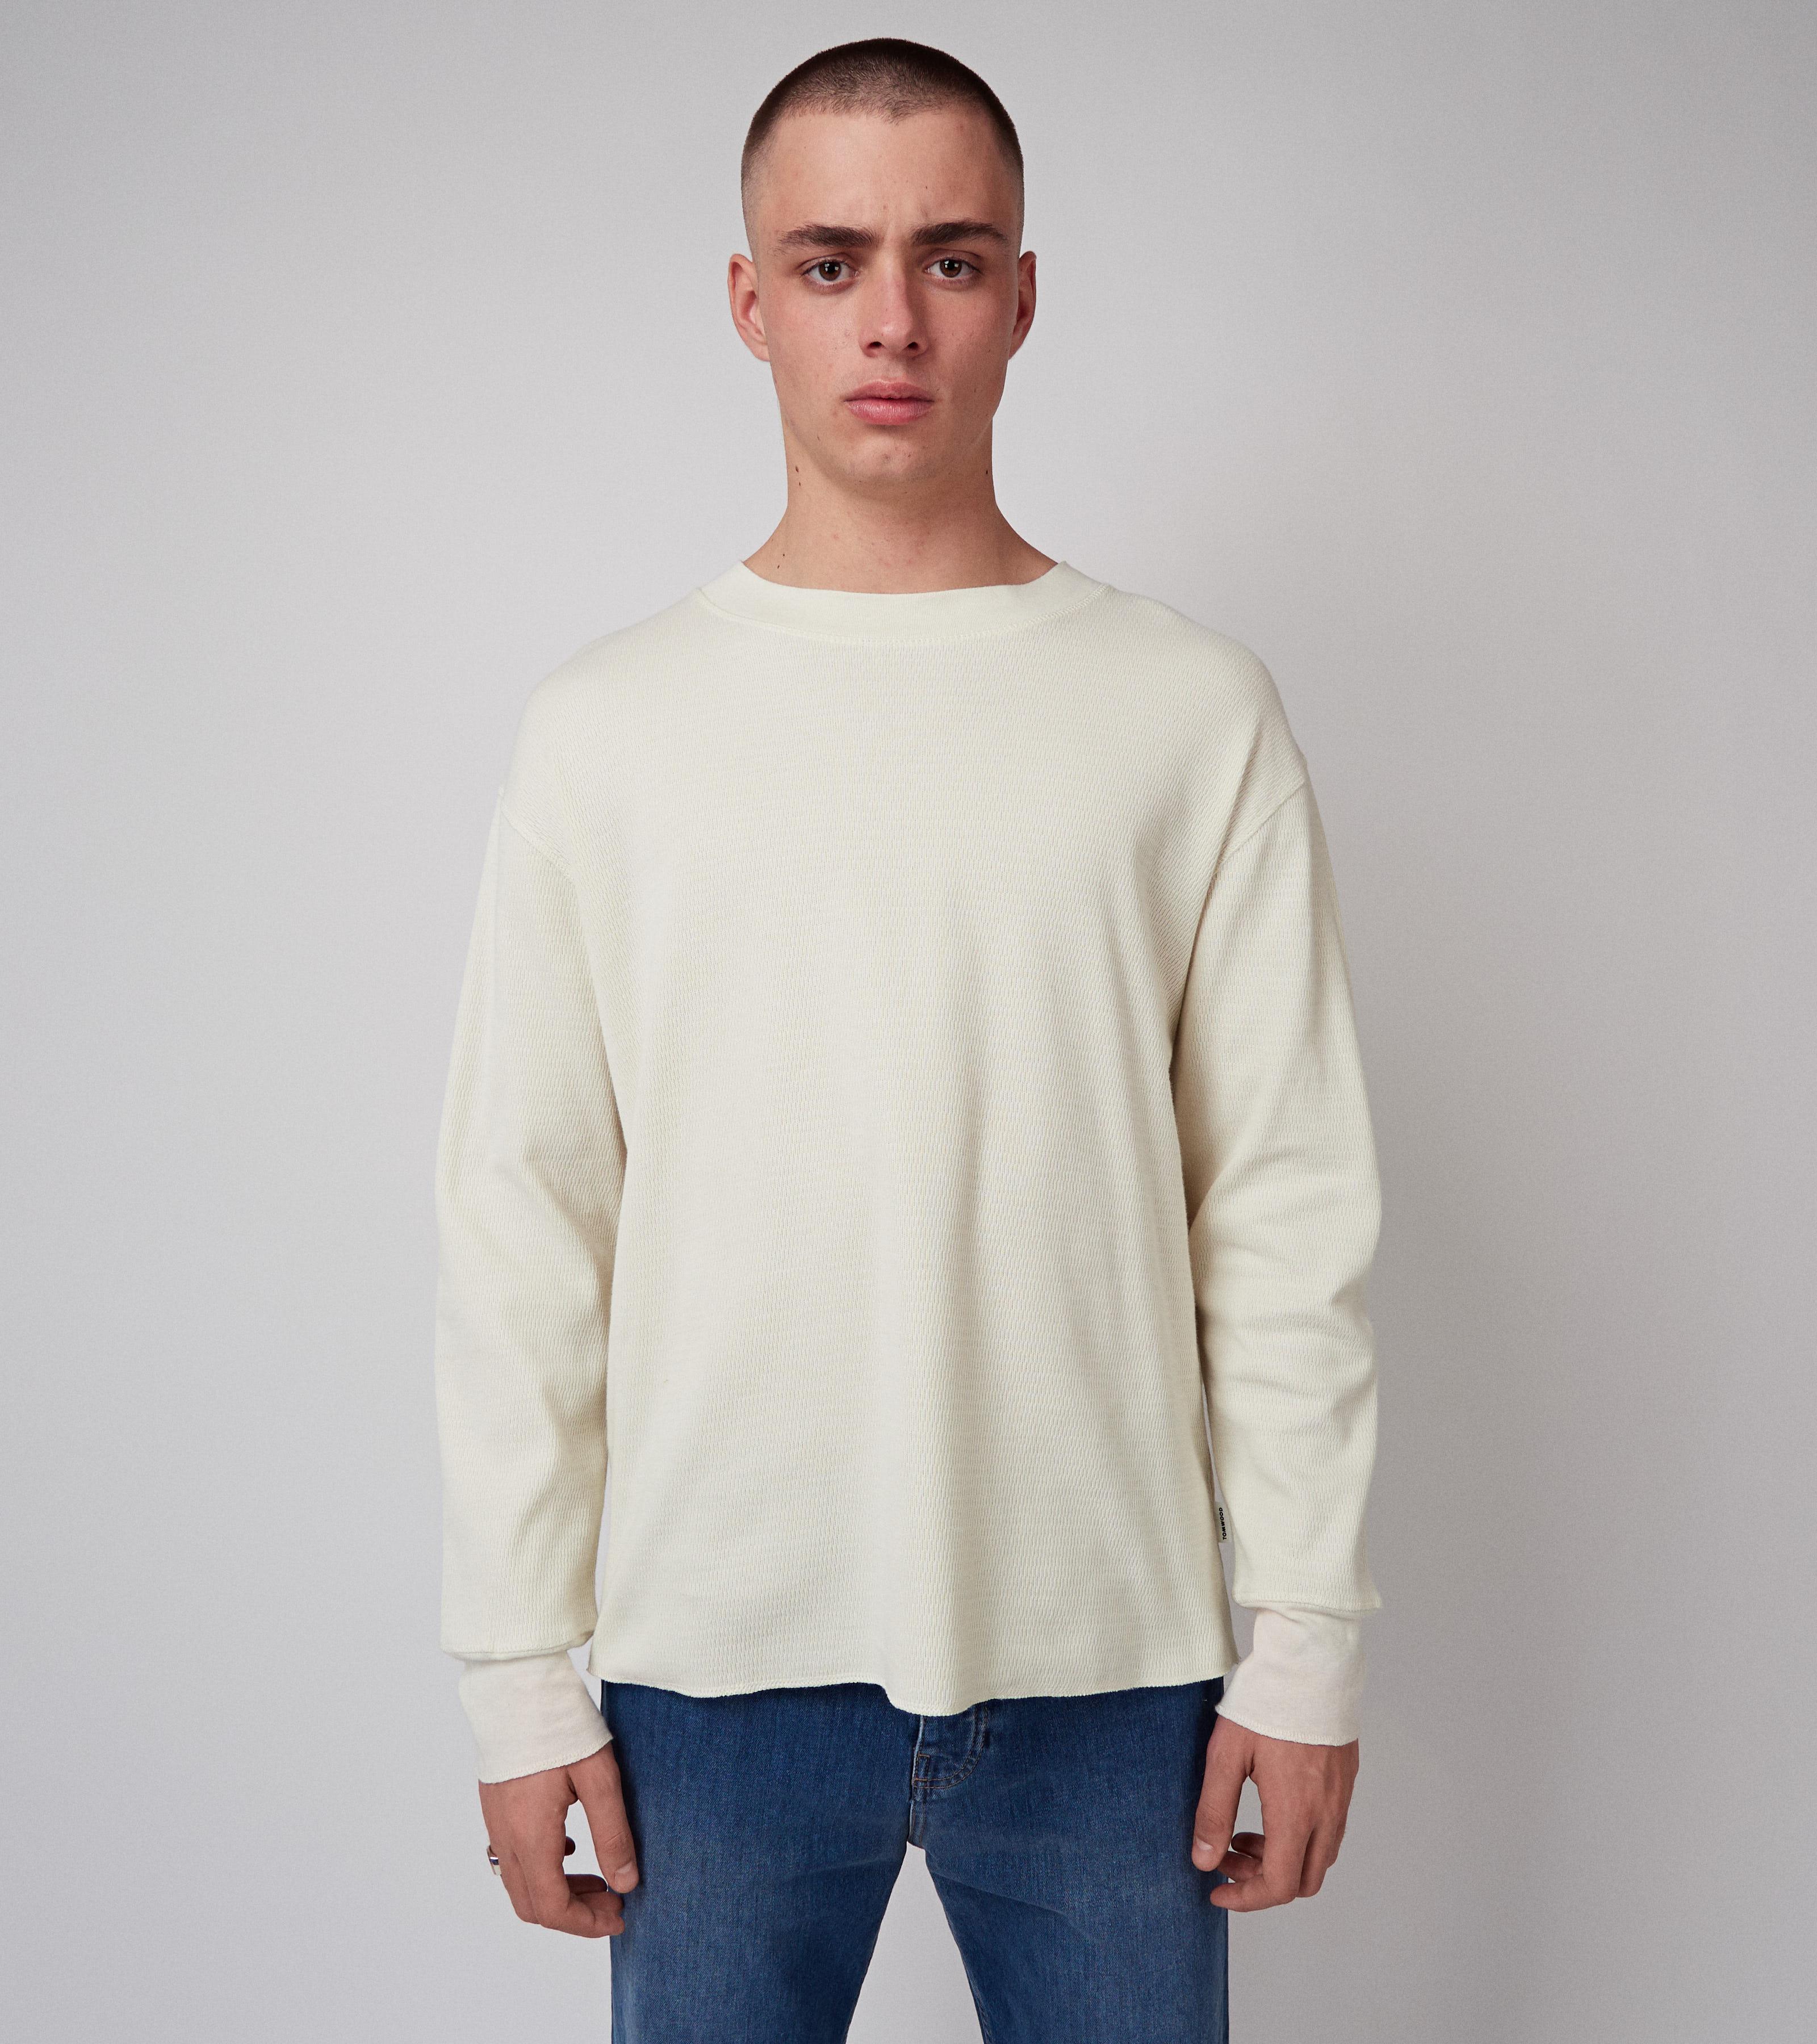 Moss Long Sleeve Vanilla White